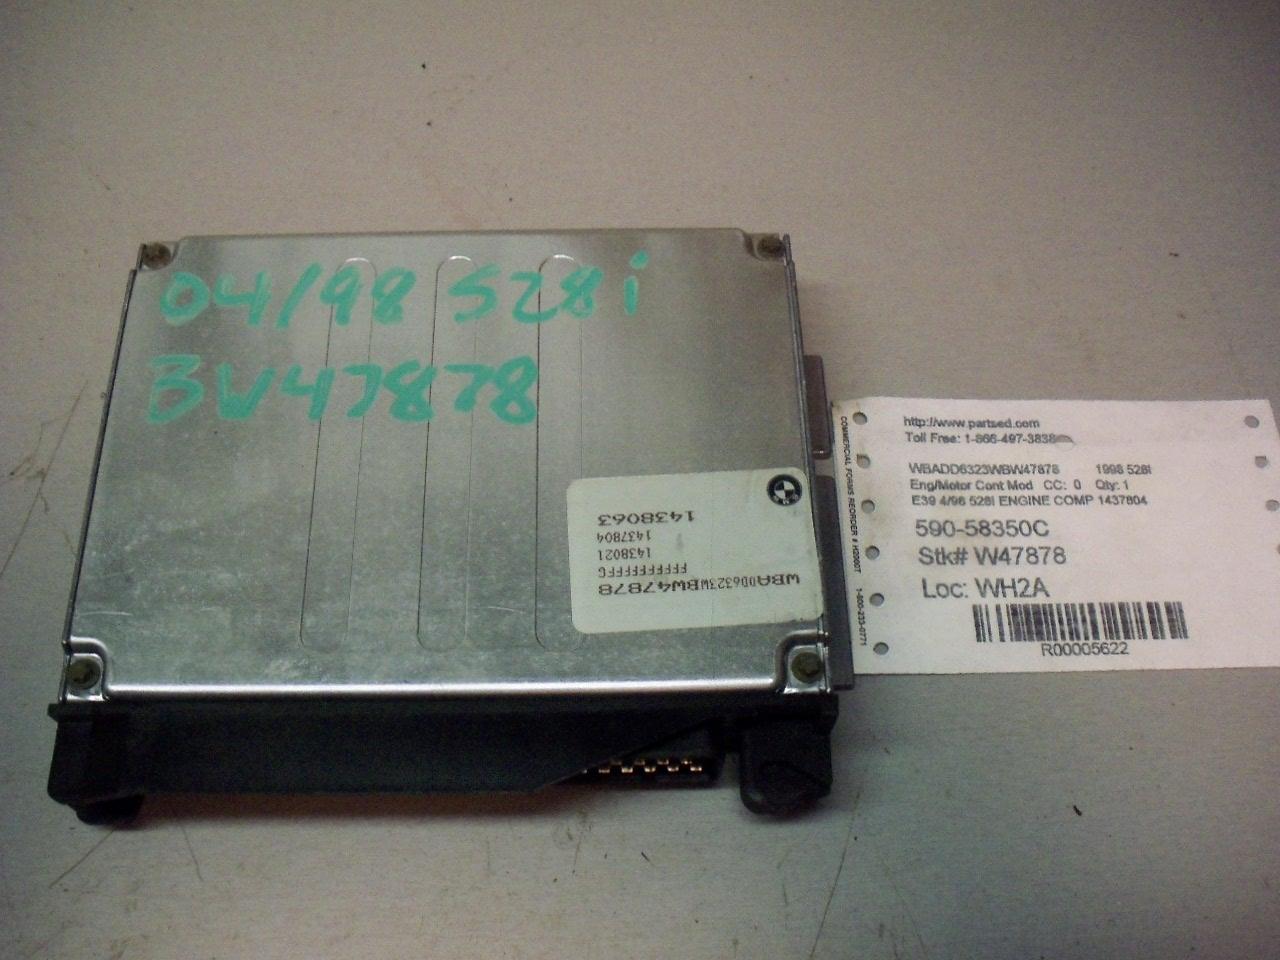 hight resolution of oem 97 1997 98 1998 bmw 528i engine computer control module ecu dme 1 437 804